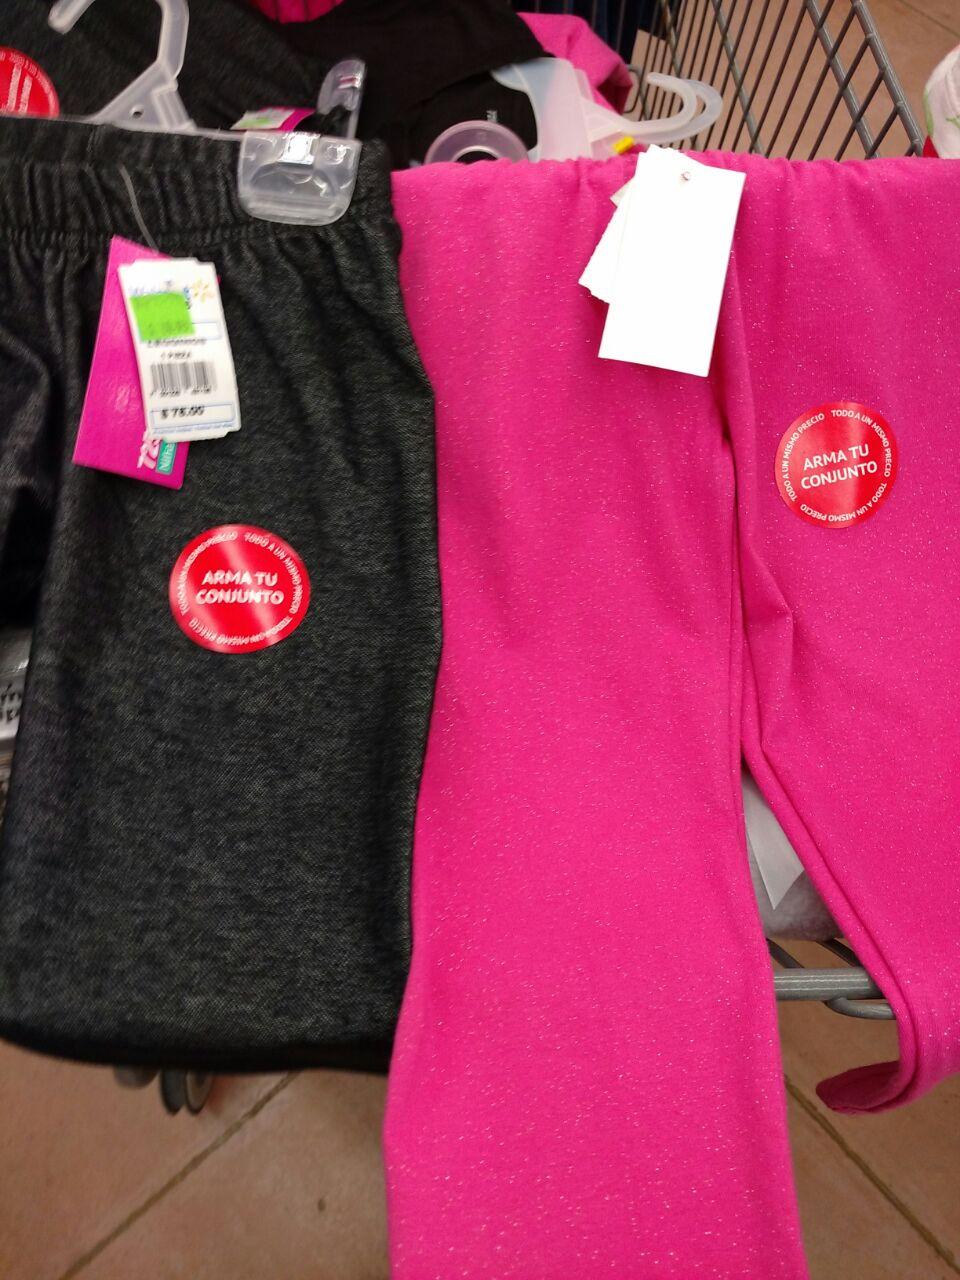 Walmart Polígono: Leggins para Niña y ropa para bebe a $30